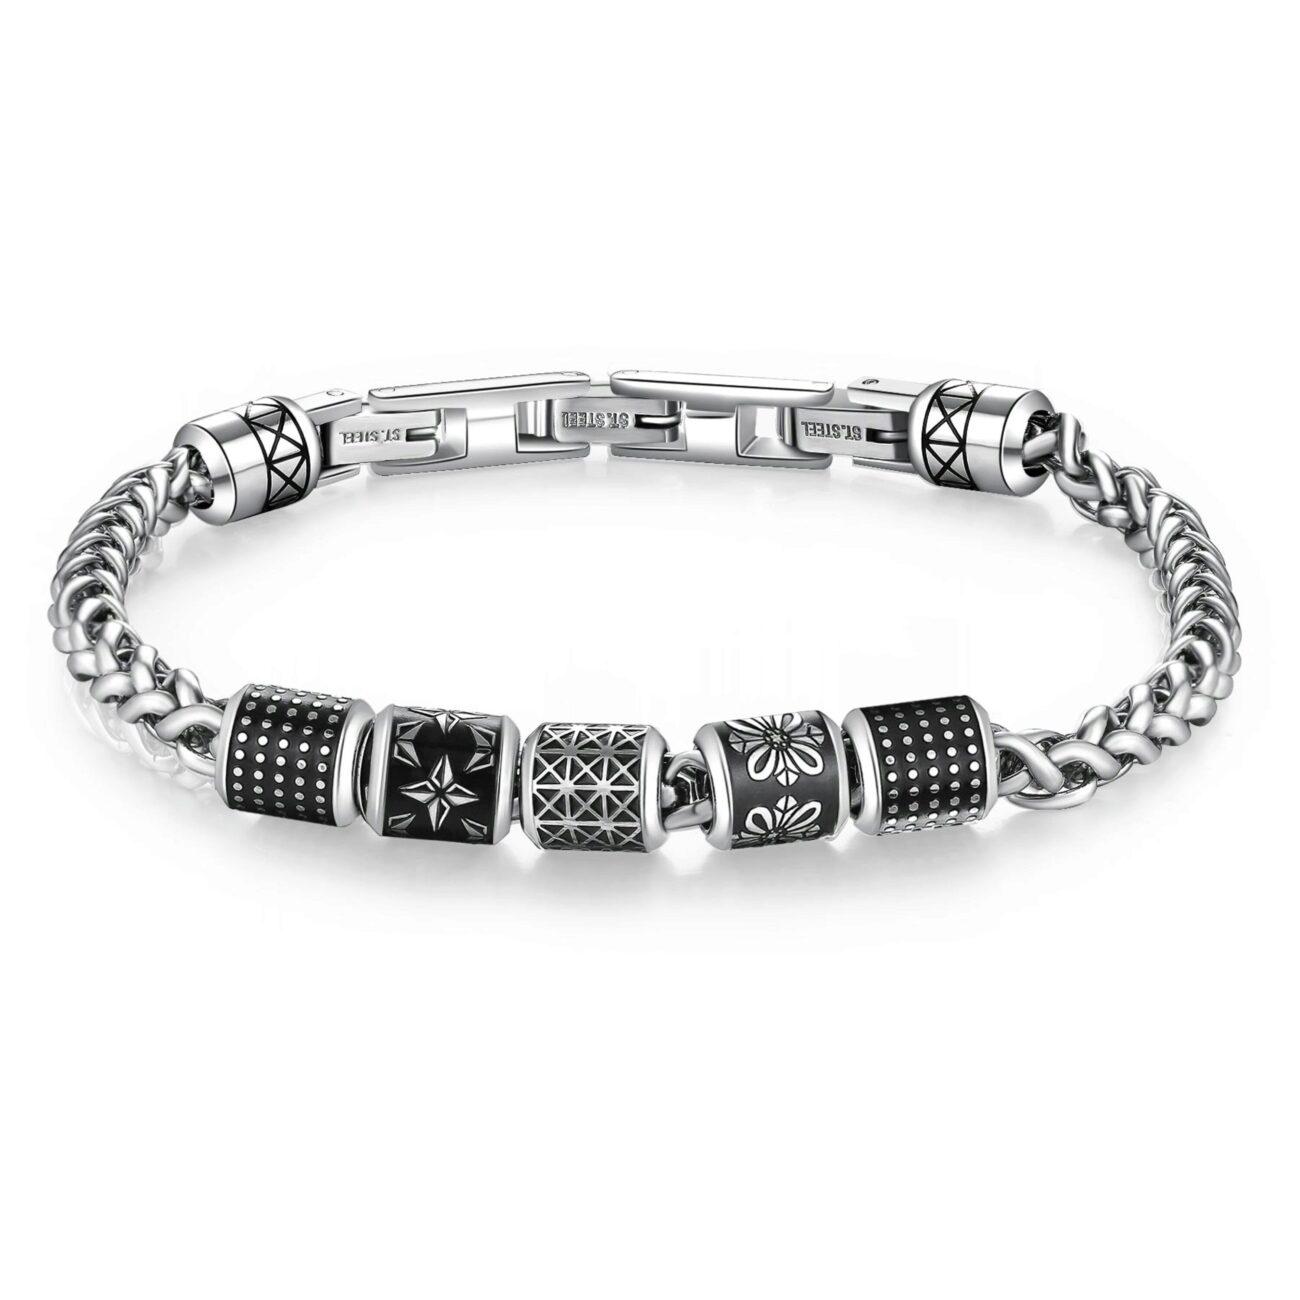 316L stainless steel bracelet with black enamel.